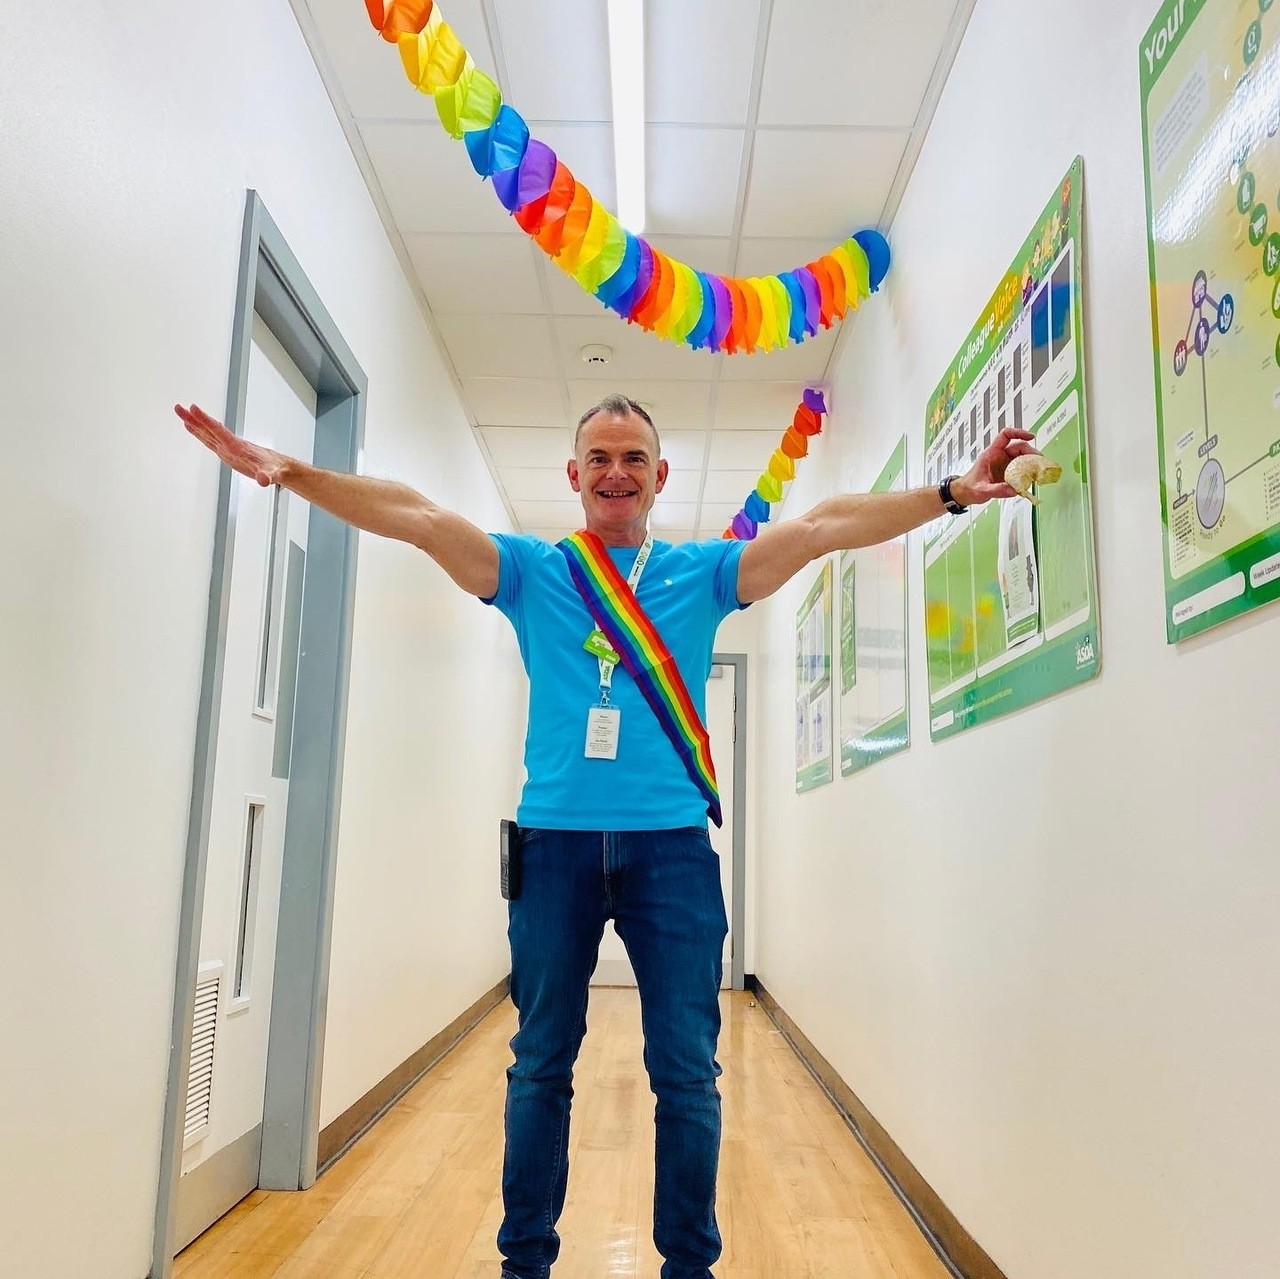 Colleagues celebrate Pride | Asda Rugby